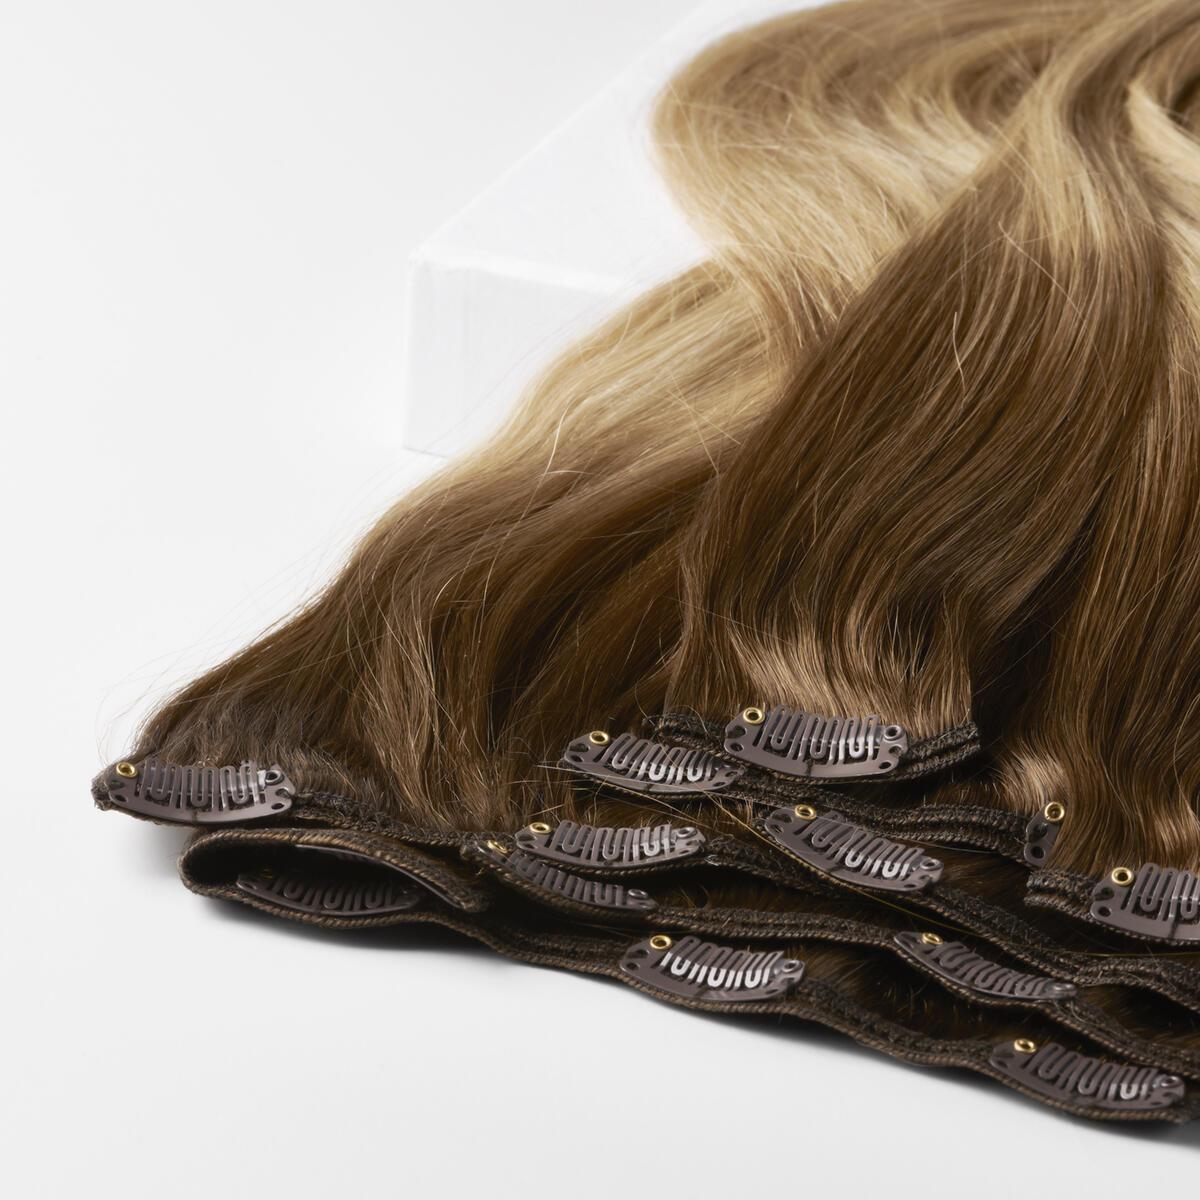 Clip-on set B5.4/7.2 Cinnamon Blonde Balayage 50 cm